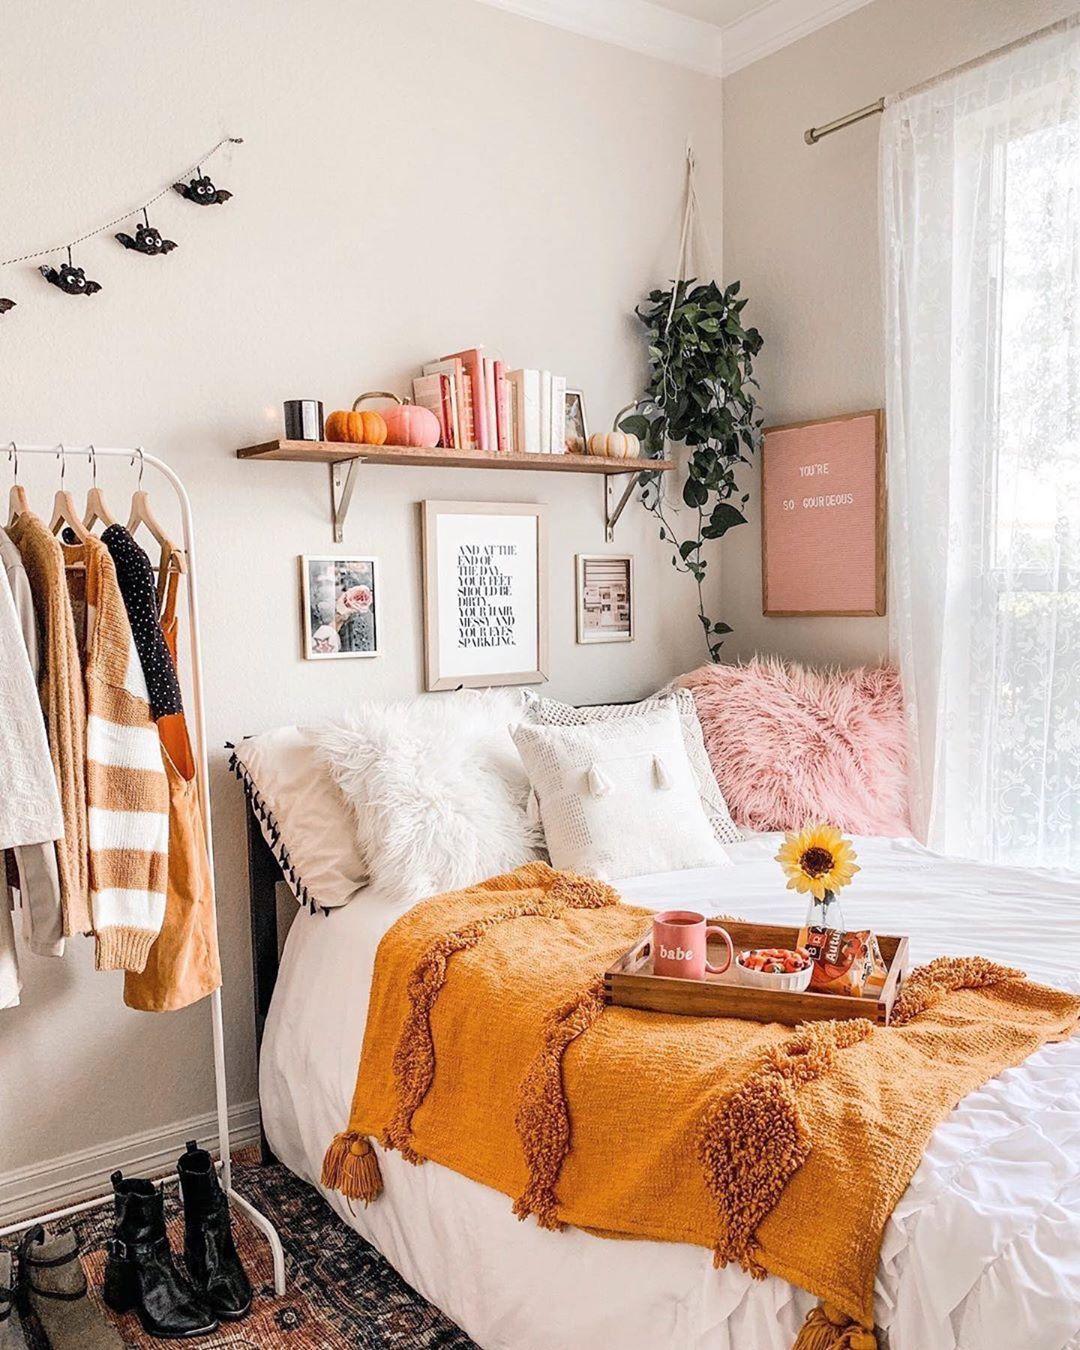 Mitzi Hudson Valley Lighting On Instagram Cozy Autumn Vibes Inspo From Astoldbymichelle Dorm Room Decor Dorm Room Inspiration Dorm Room Designs